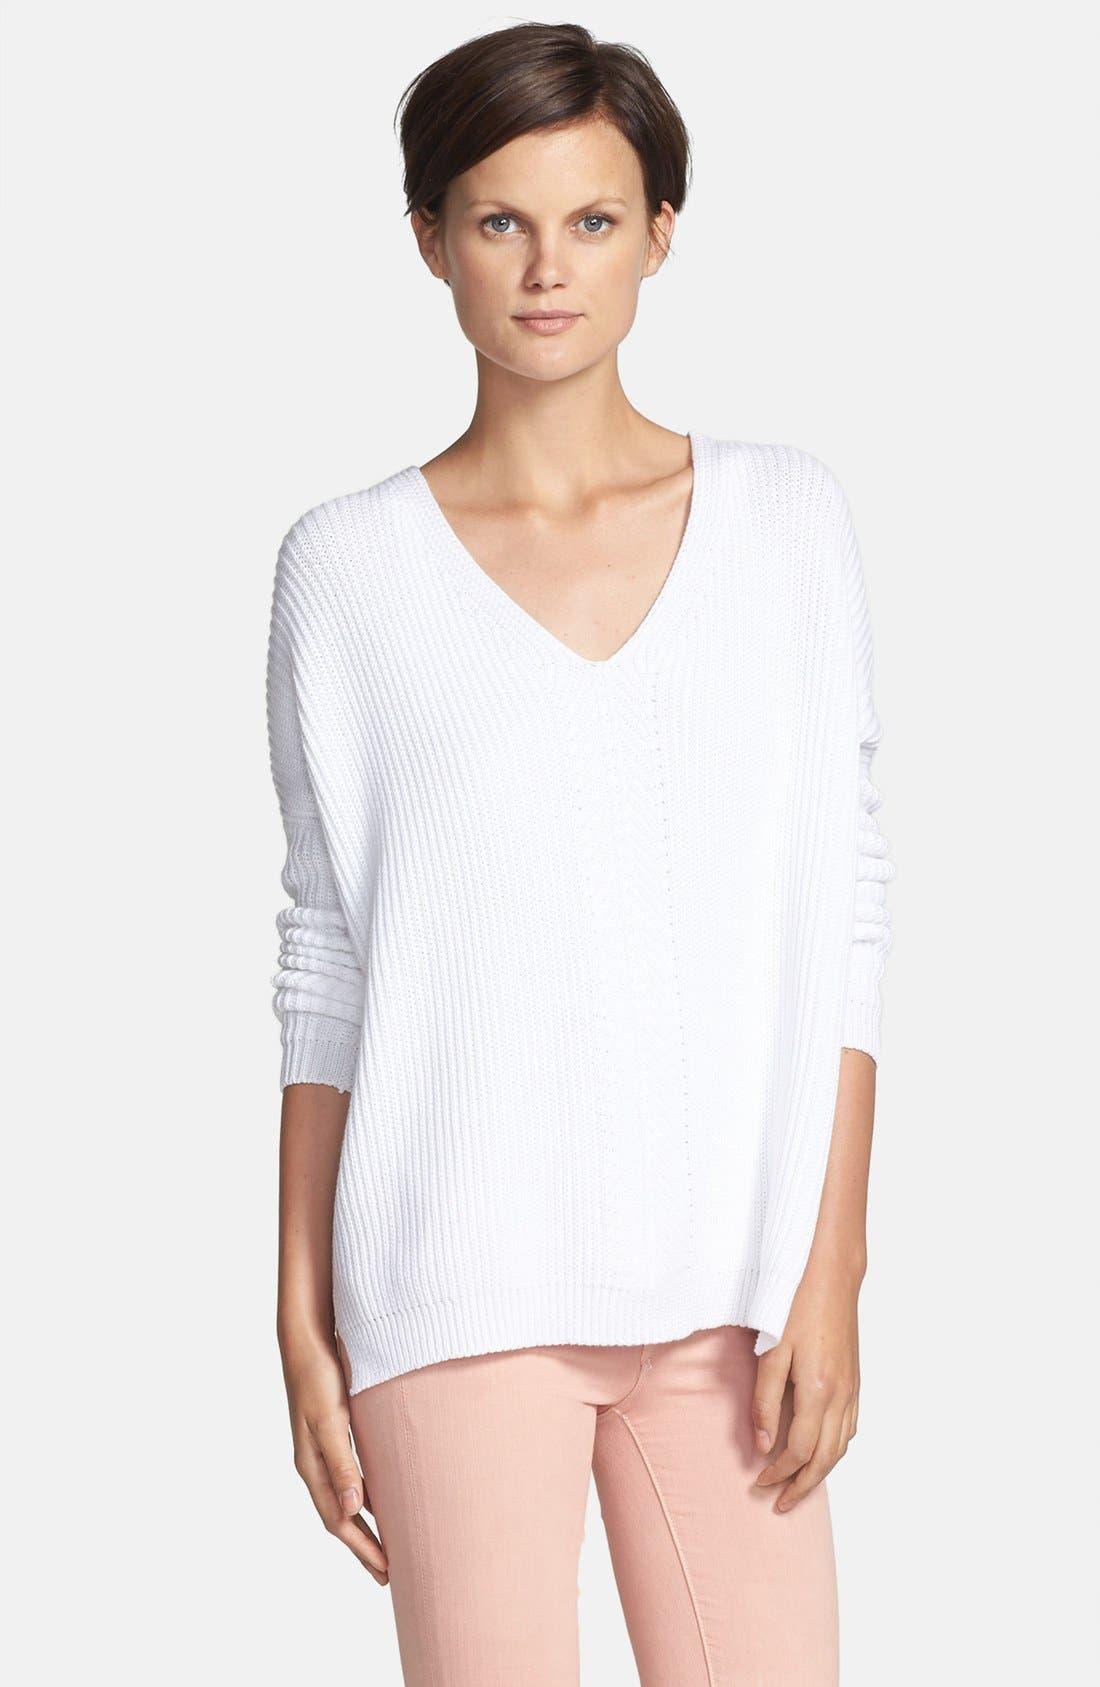 Alternate Image 1 Selected - Vince 'Directional' V-Neck Ribbed Sweater